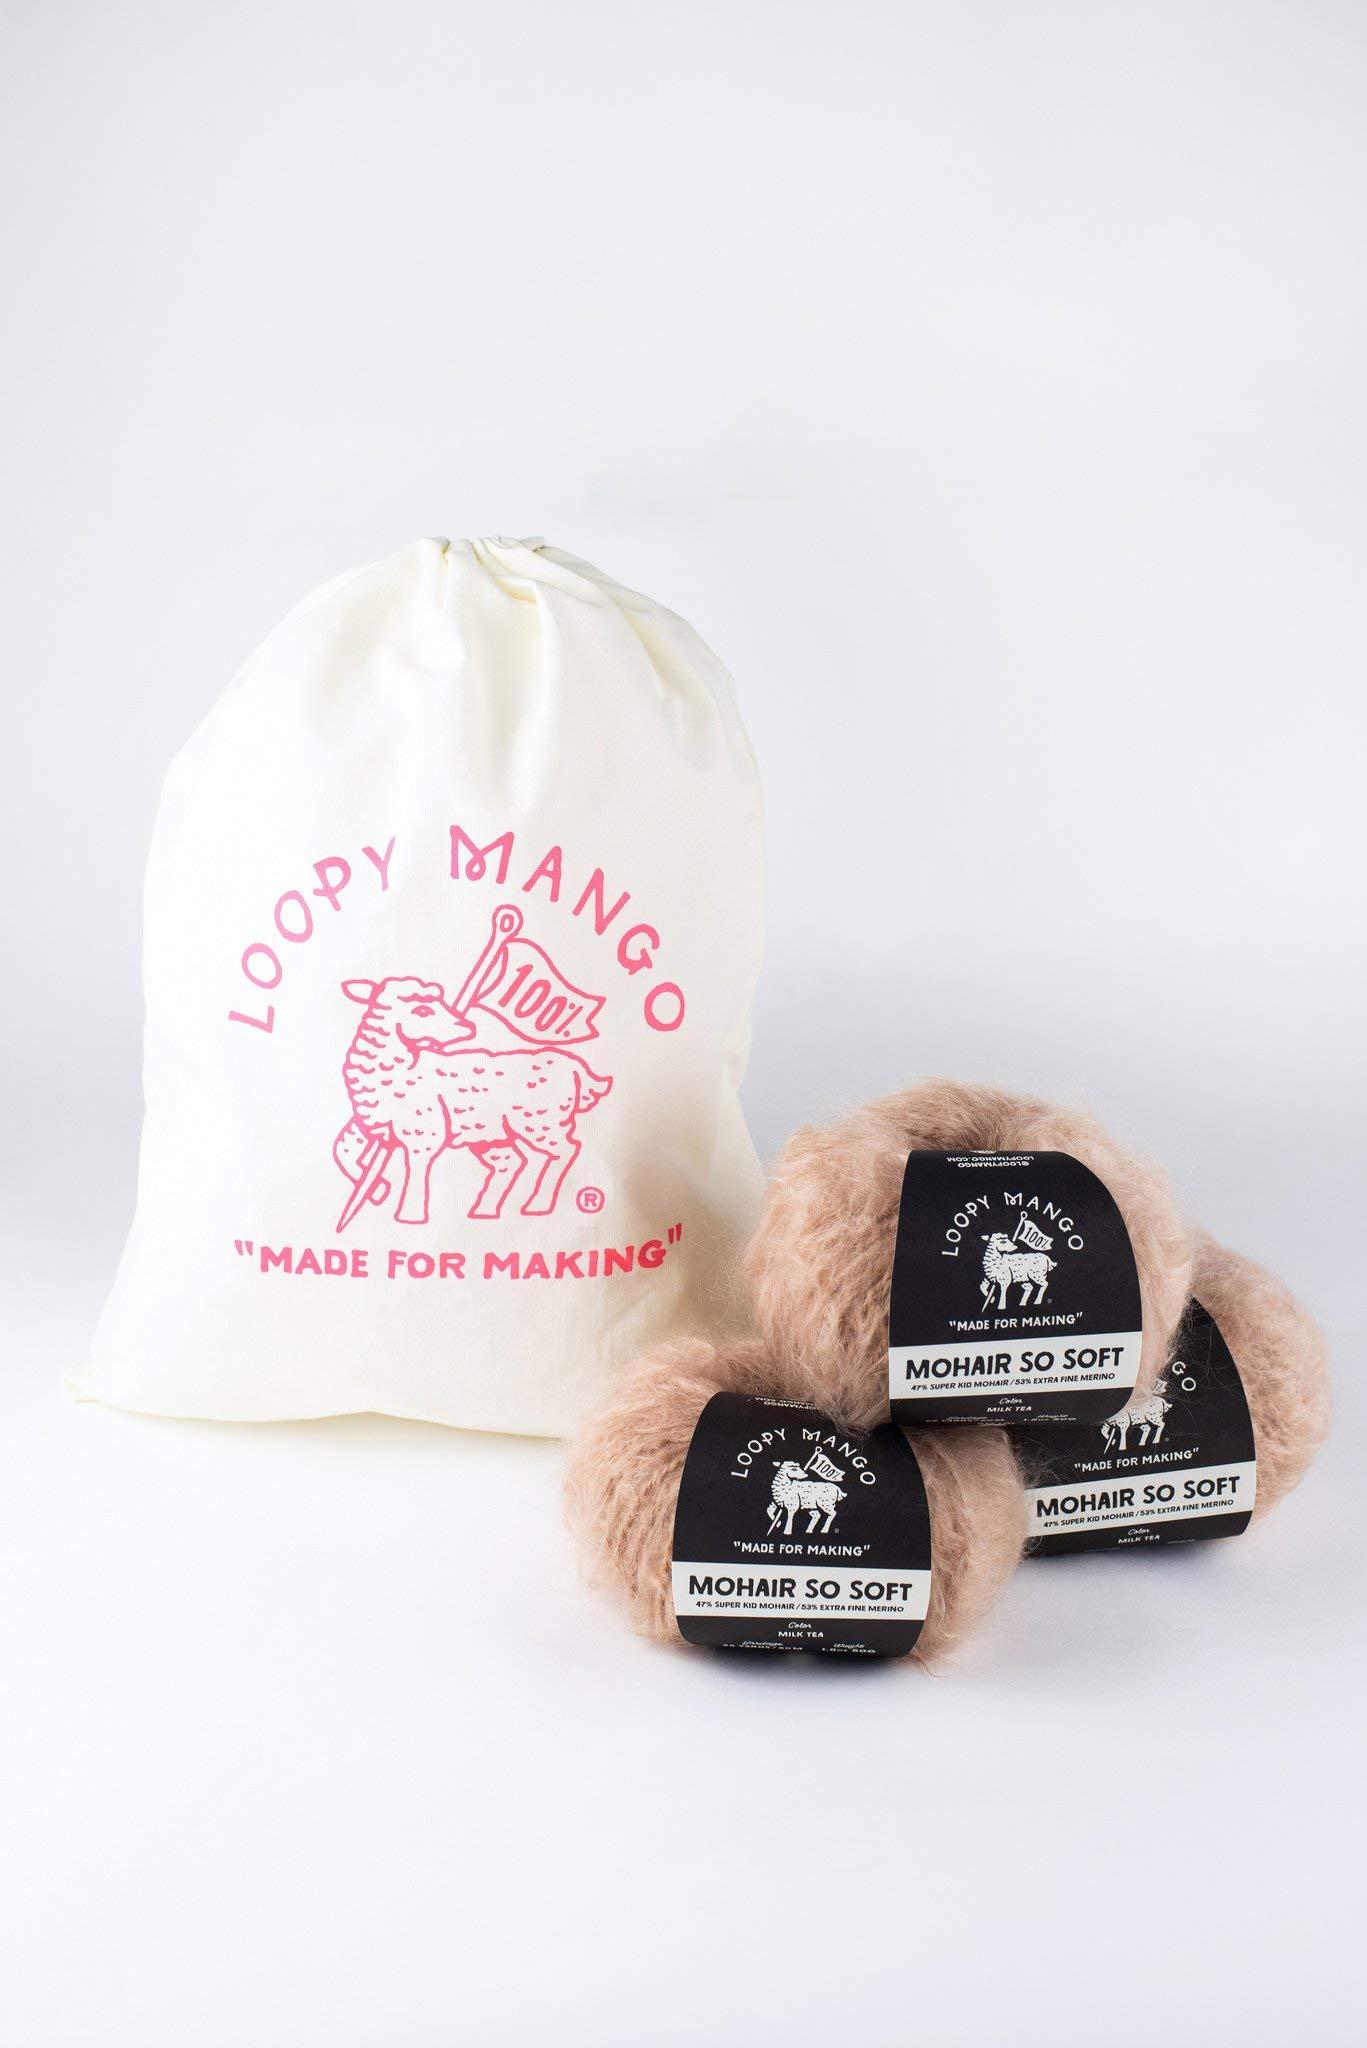 Loopy Mango DIY Knit Kit - Medium/Large Long Cardigan - Mohair So Soft (Moss) by Loopy Mango (Image #2)